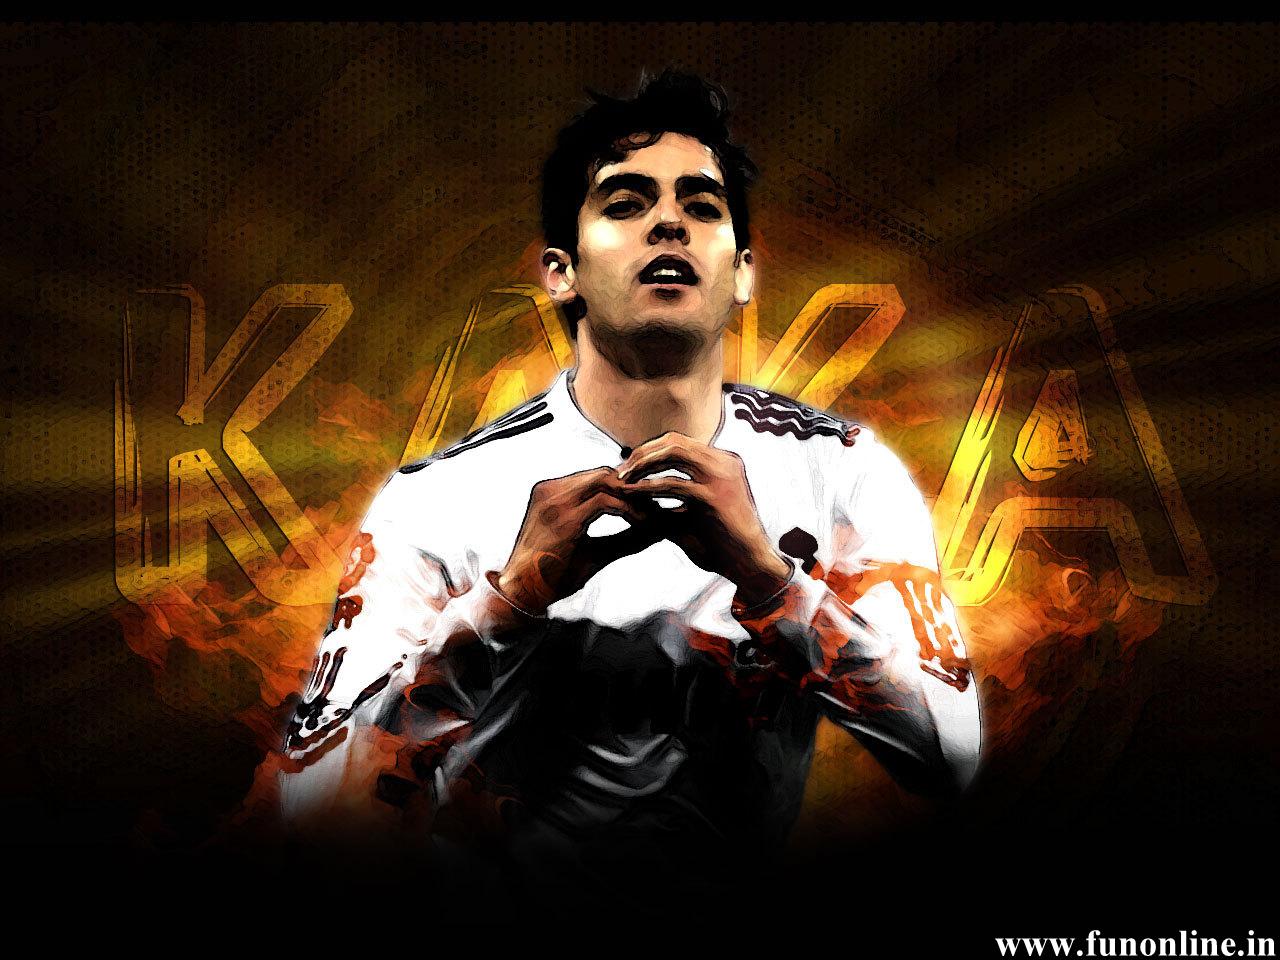 Ricardo Kaka Wallpapers Download Midfielder Ricardo Kaka HD Wallpaper 1280x960